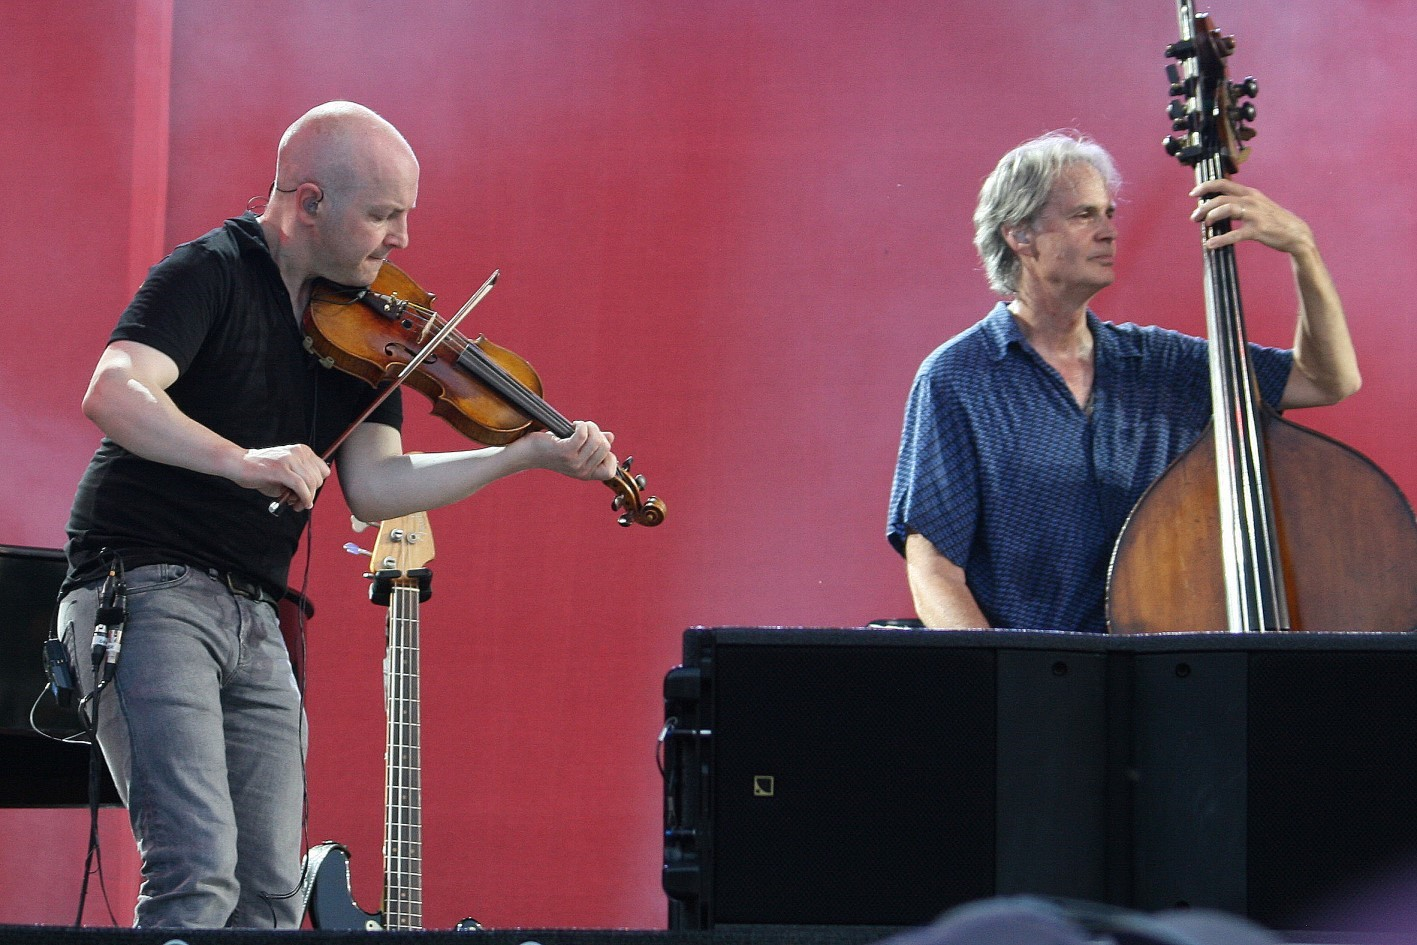 John McCusker und Glenn Worf